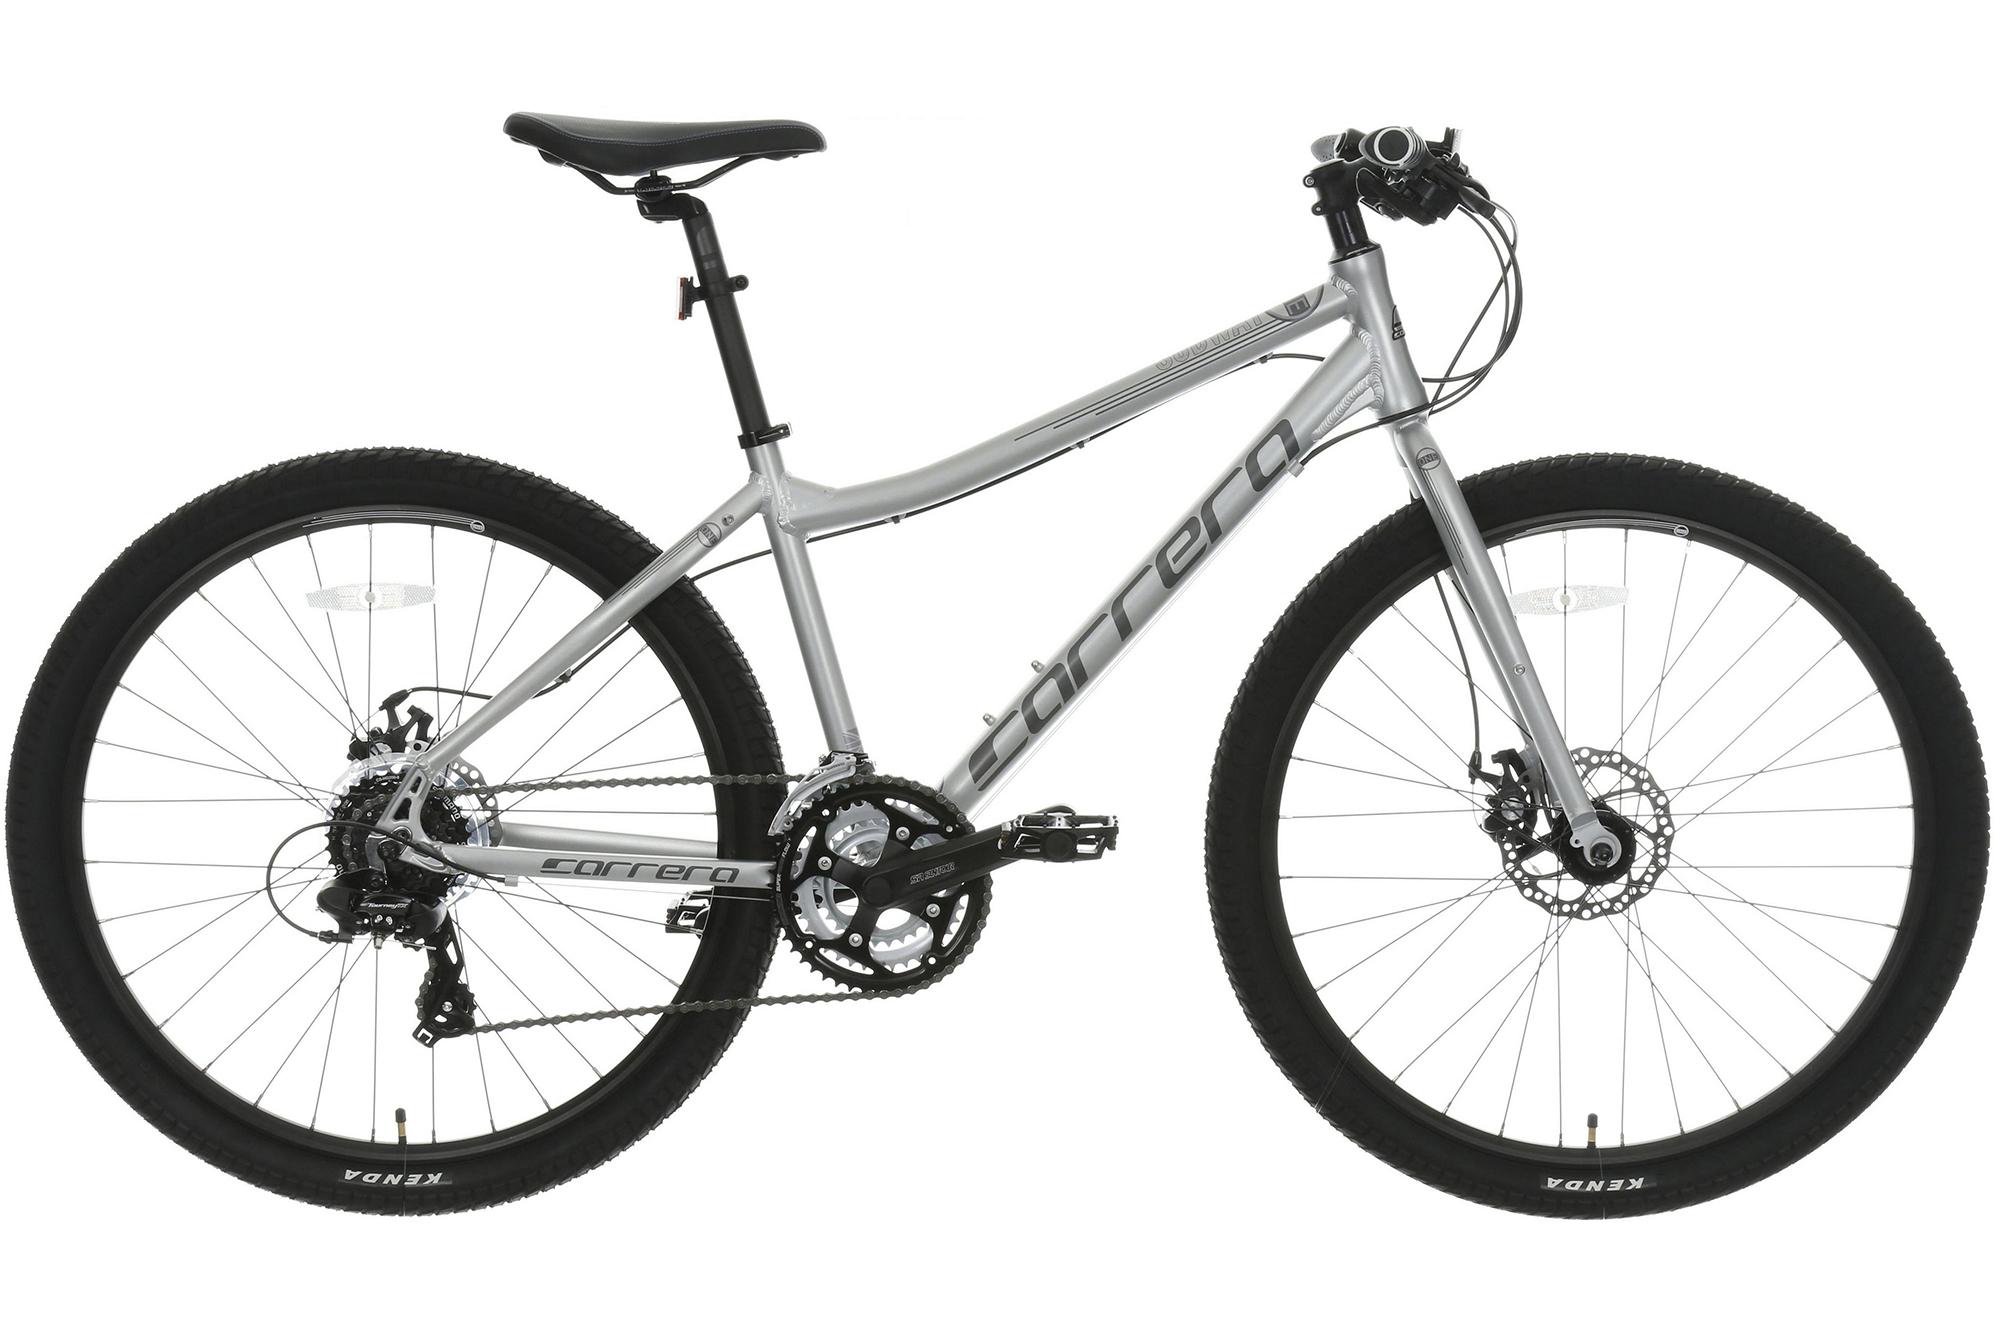 3a6387a7662 12 best hybrid bikes of 2019: best hybrid models for the money ...